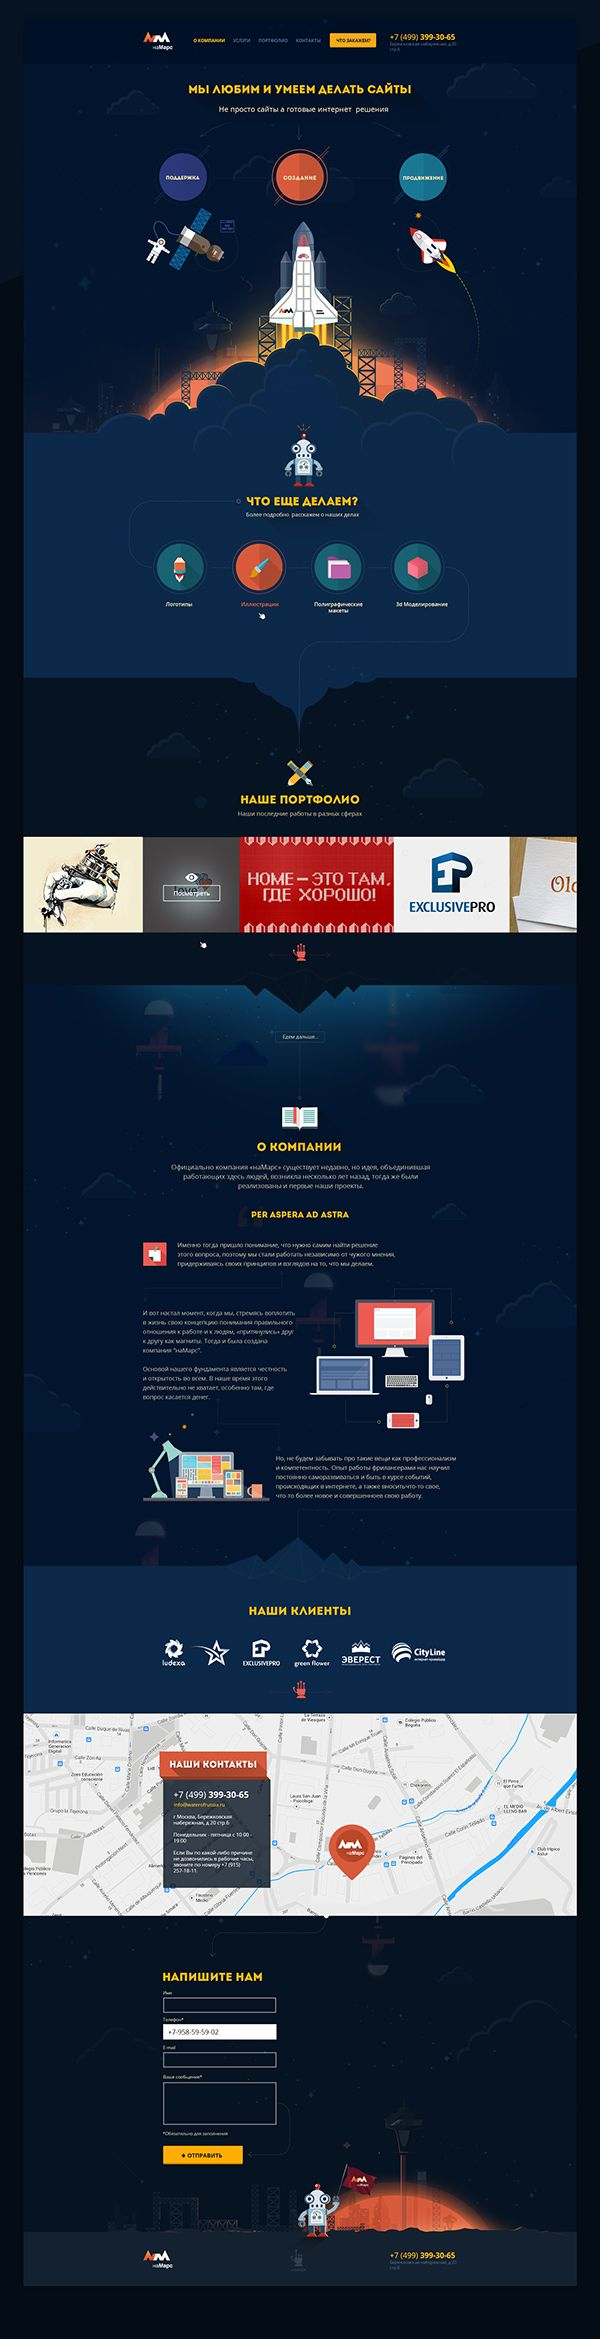 NaMars Web-Studio ReDesign